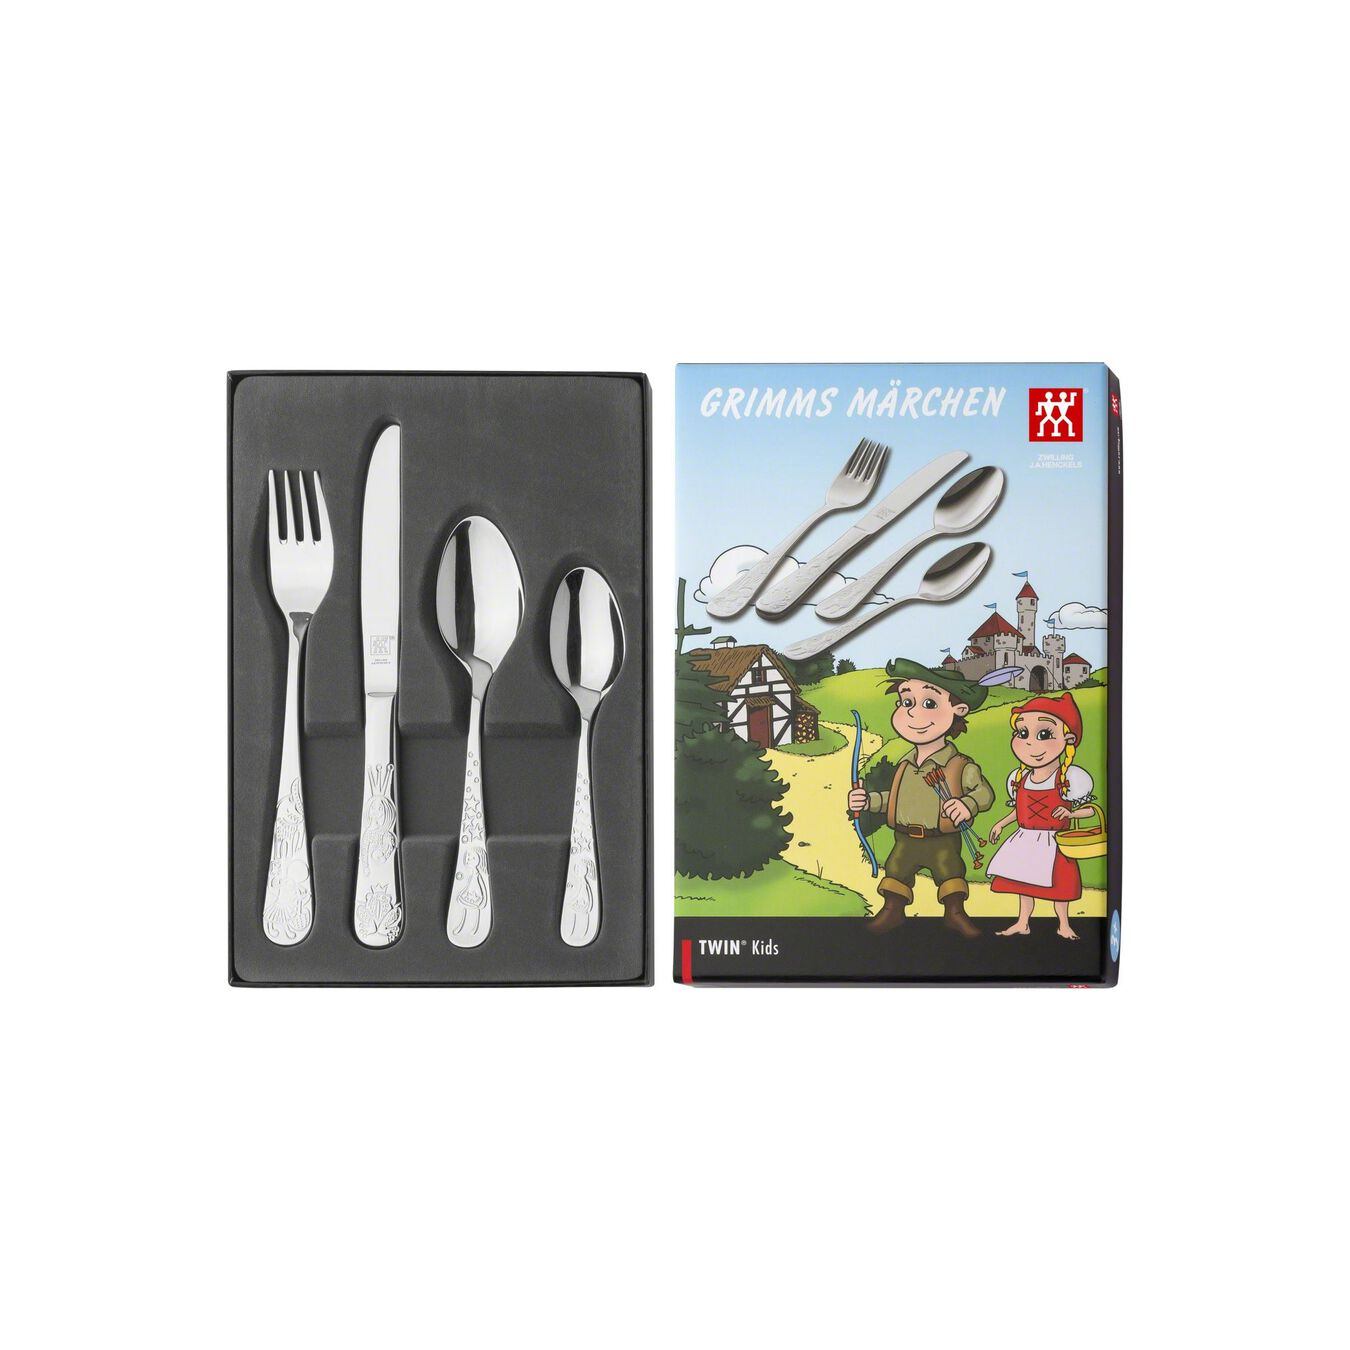 4-pc Children's flatware set, special formula steel ,,large 2